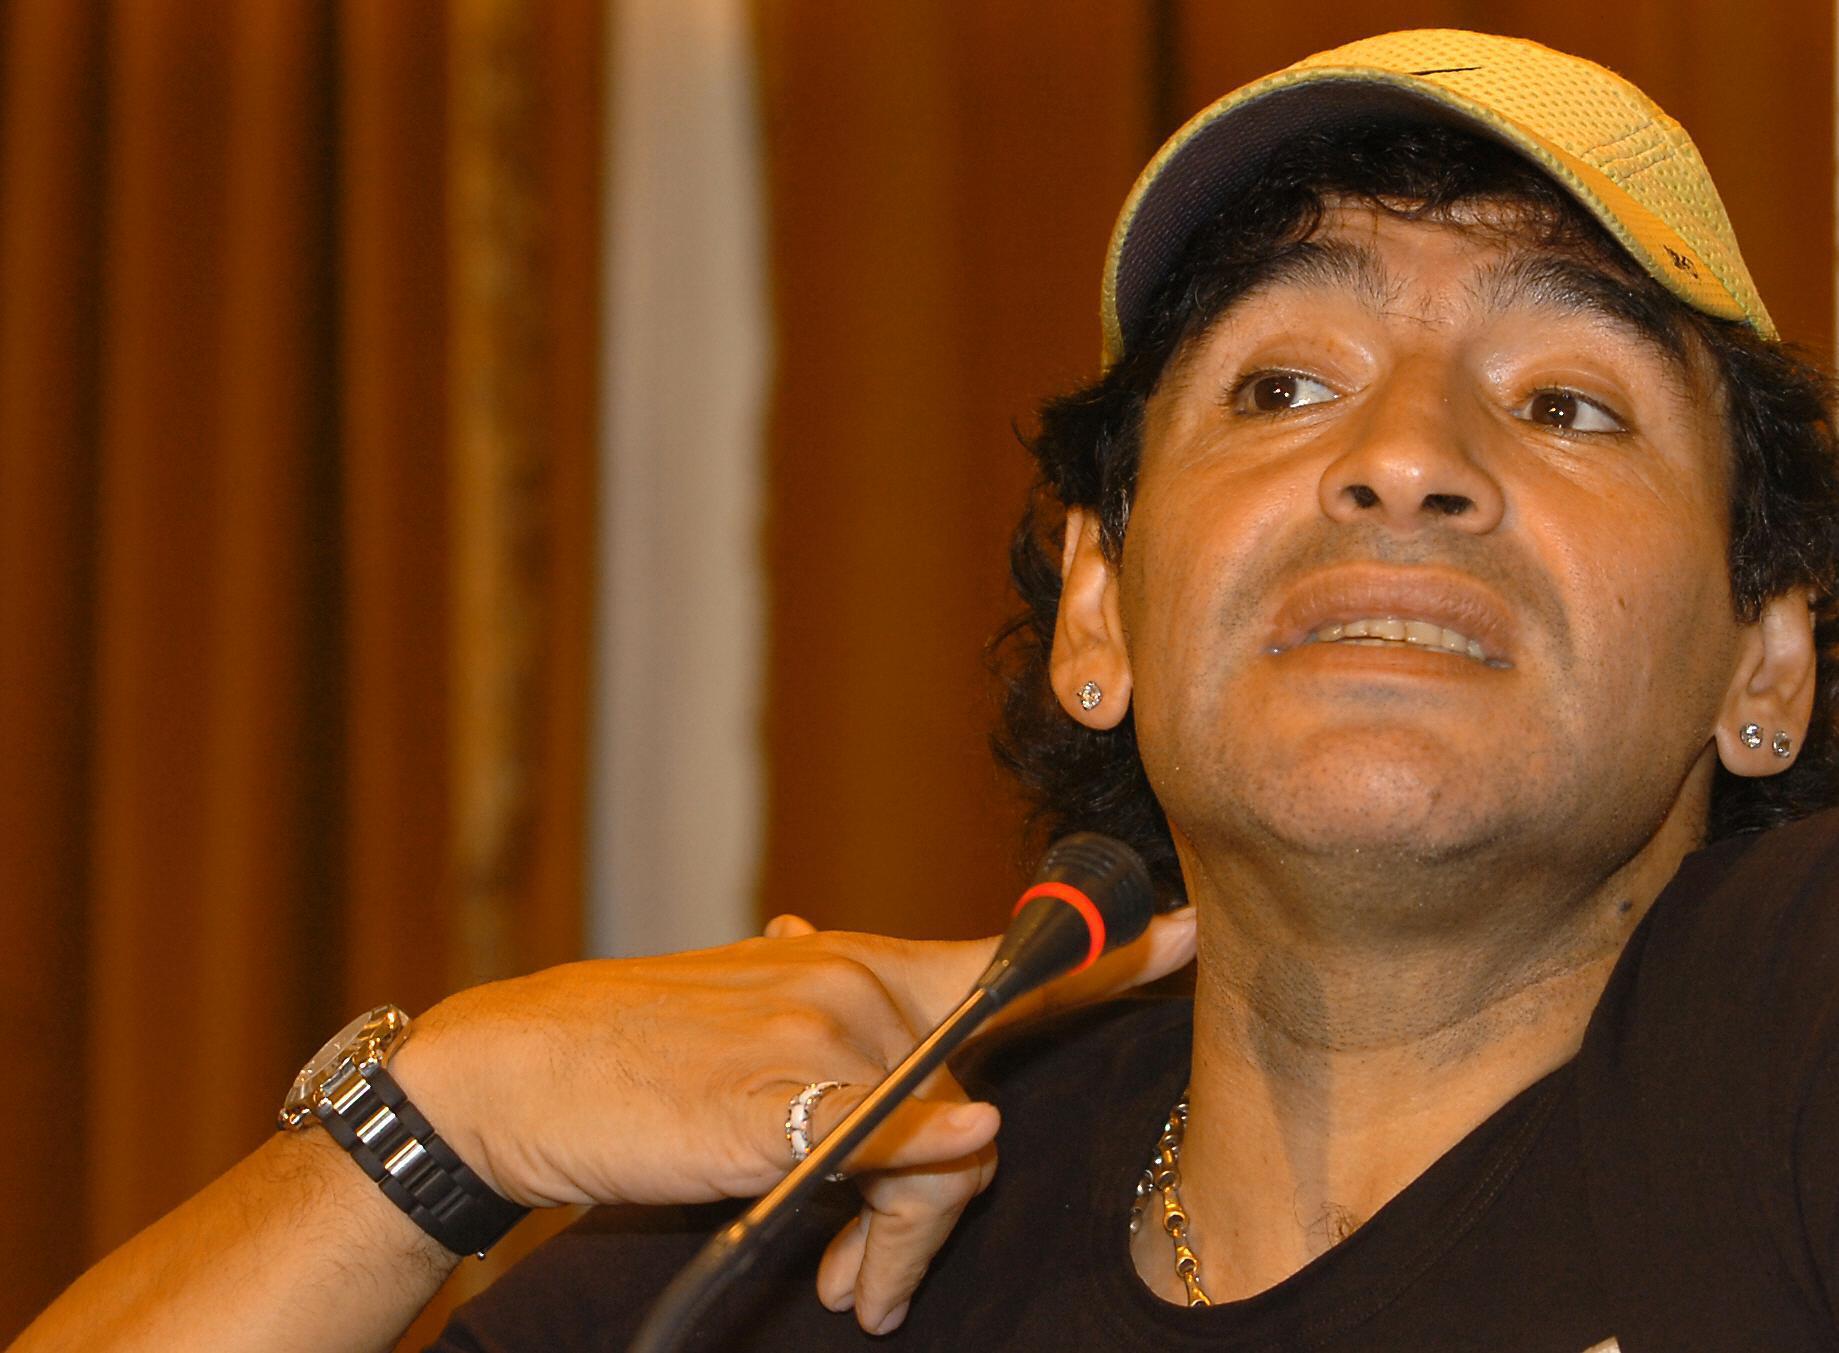 Bild zu Diego Maradona, Pressekonferenz, Buenos Aires, Alejandro Mancuso